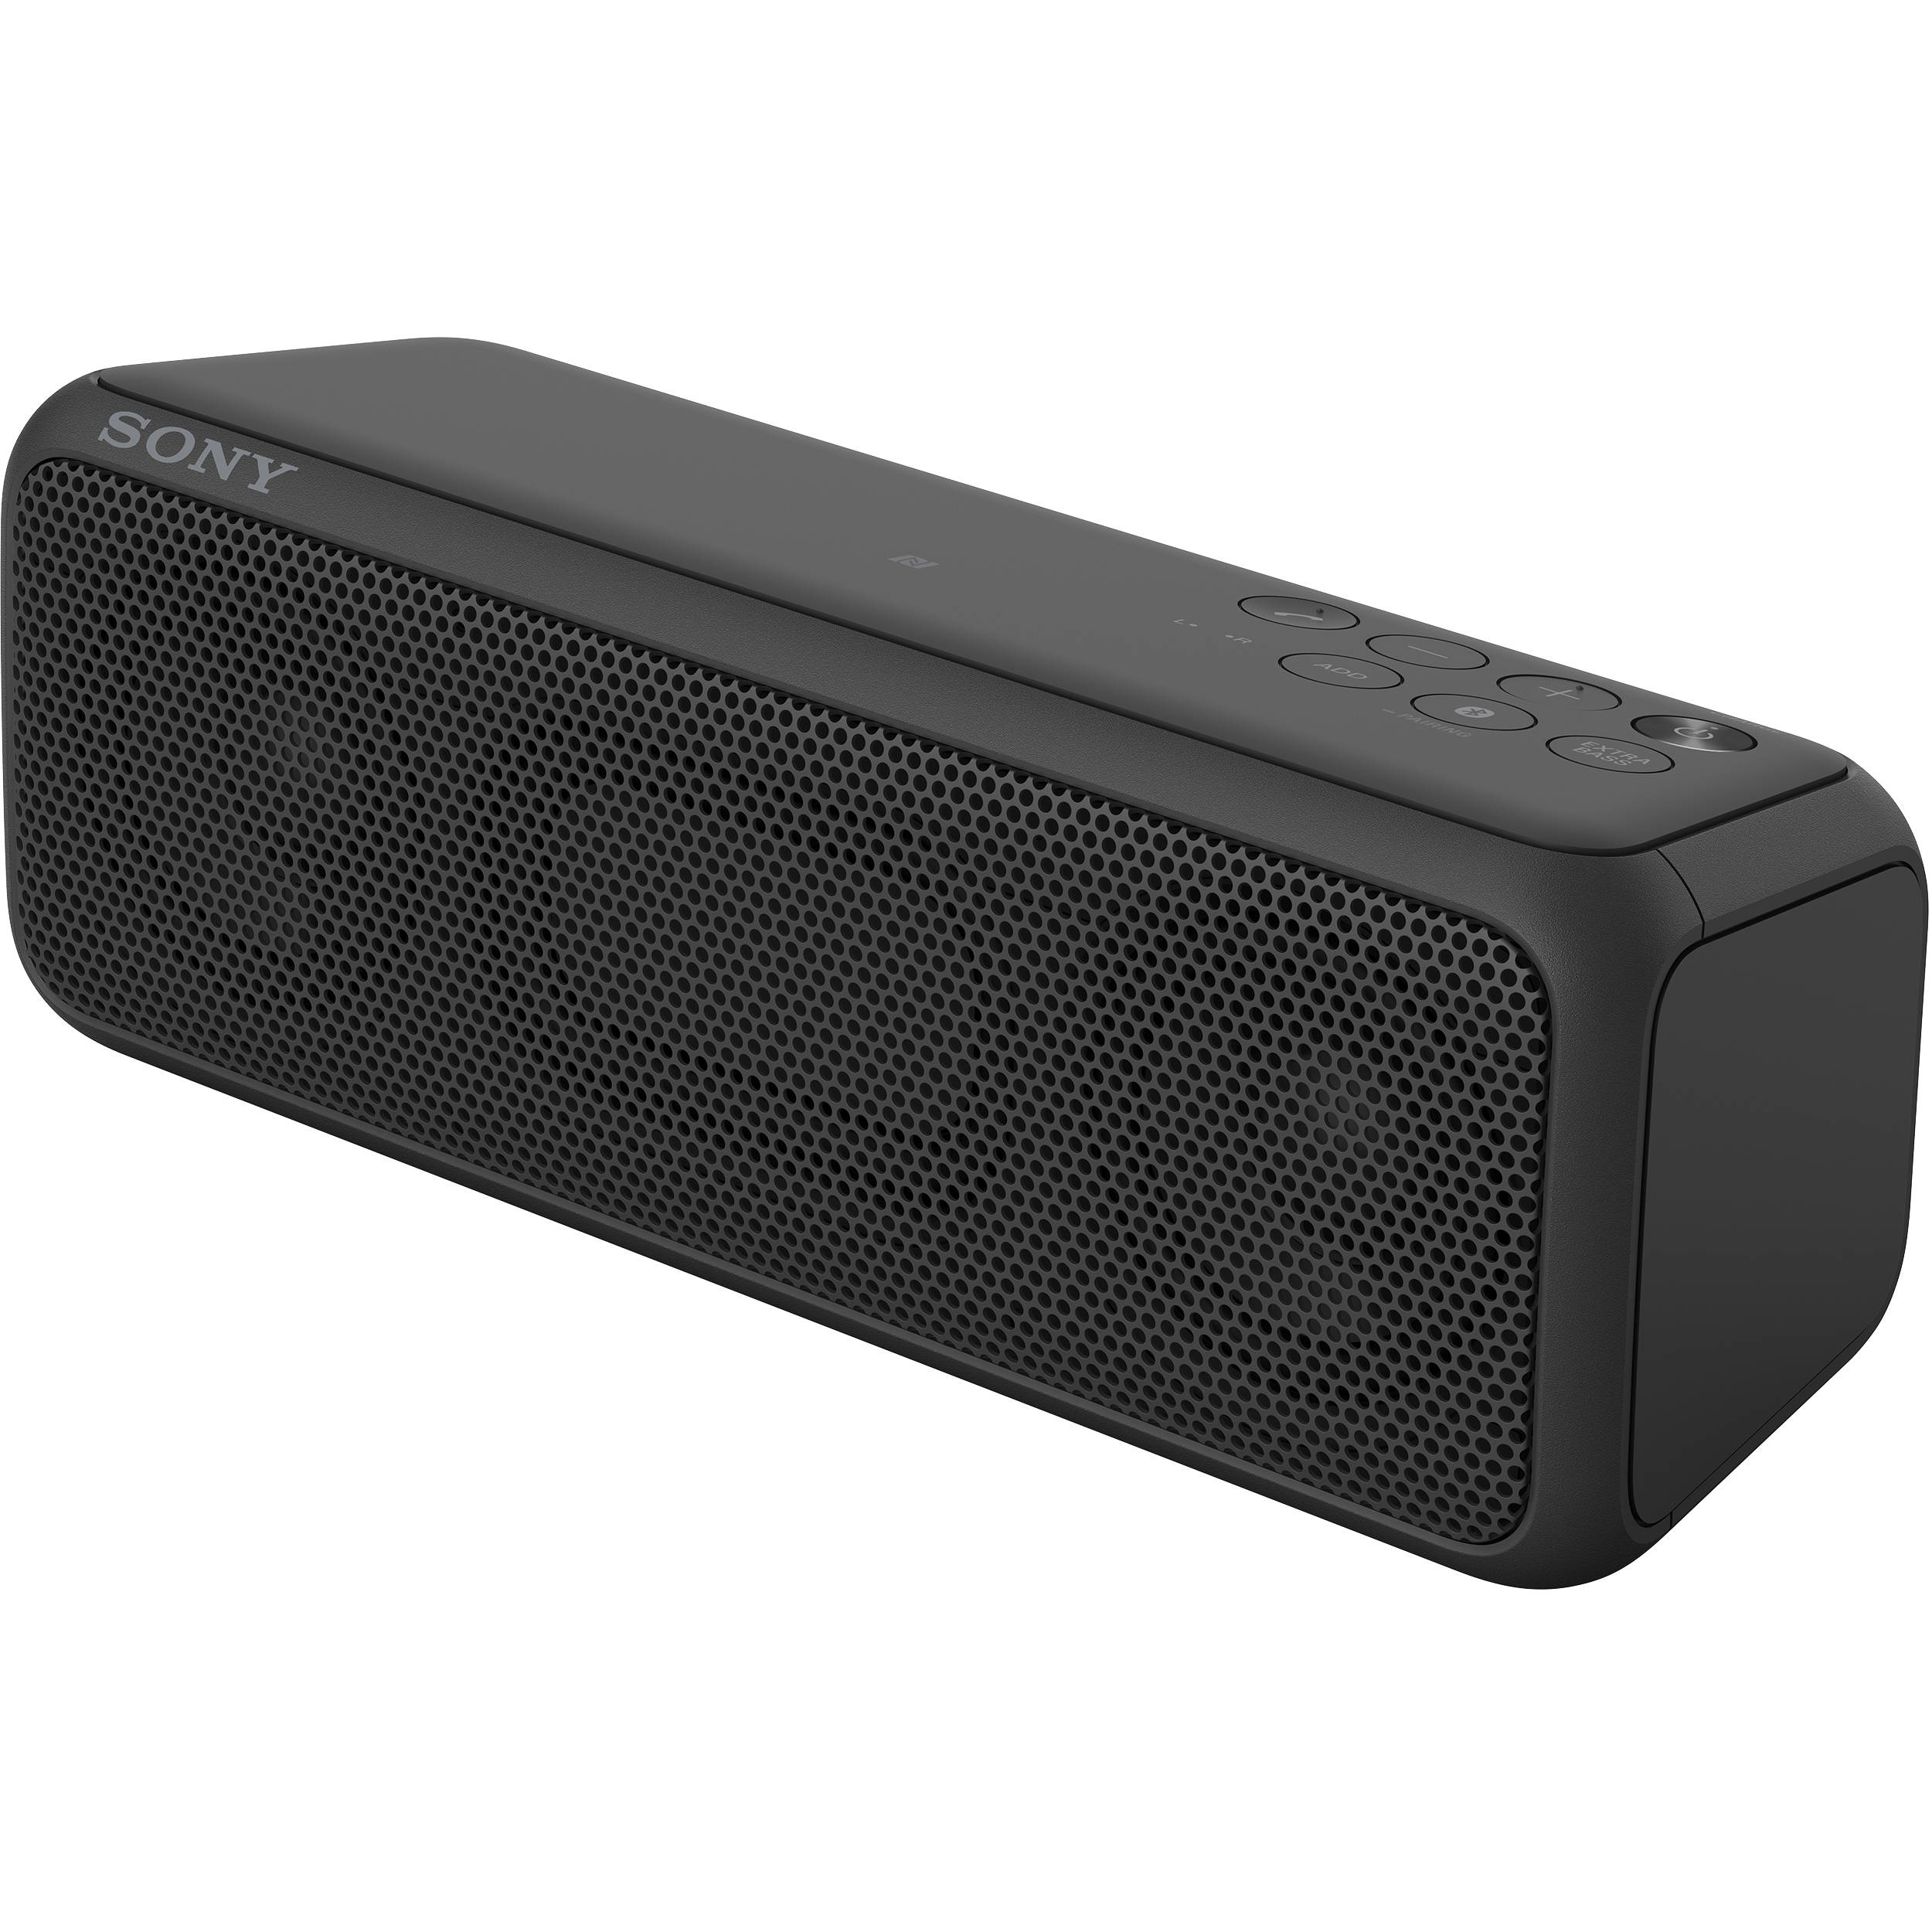 Black Sony SRSXB3 Portable Bluetooth Wireless Speaker